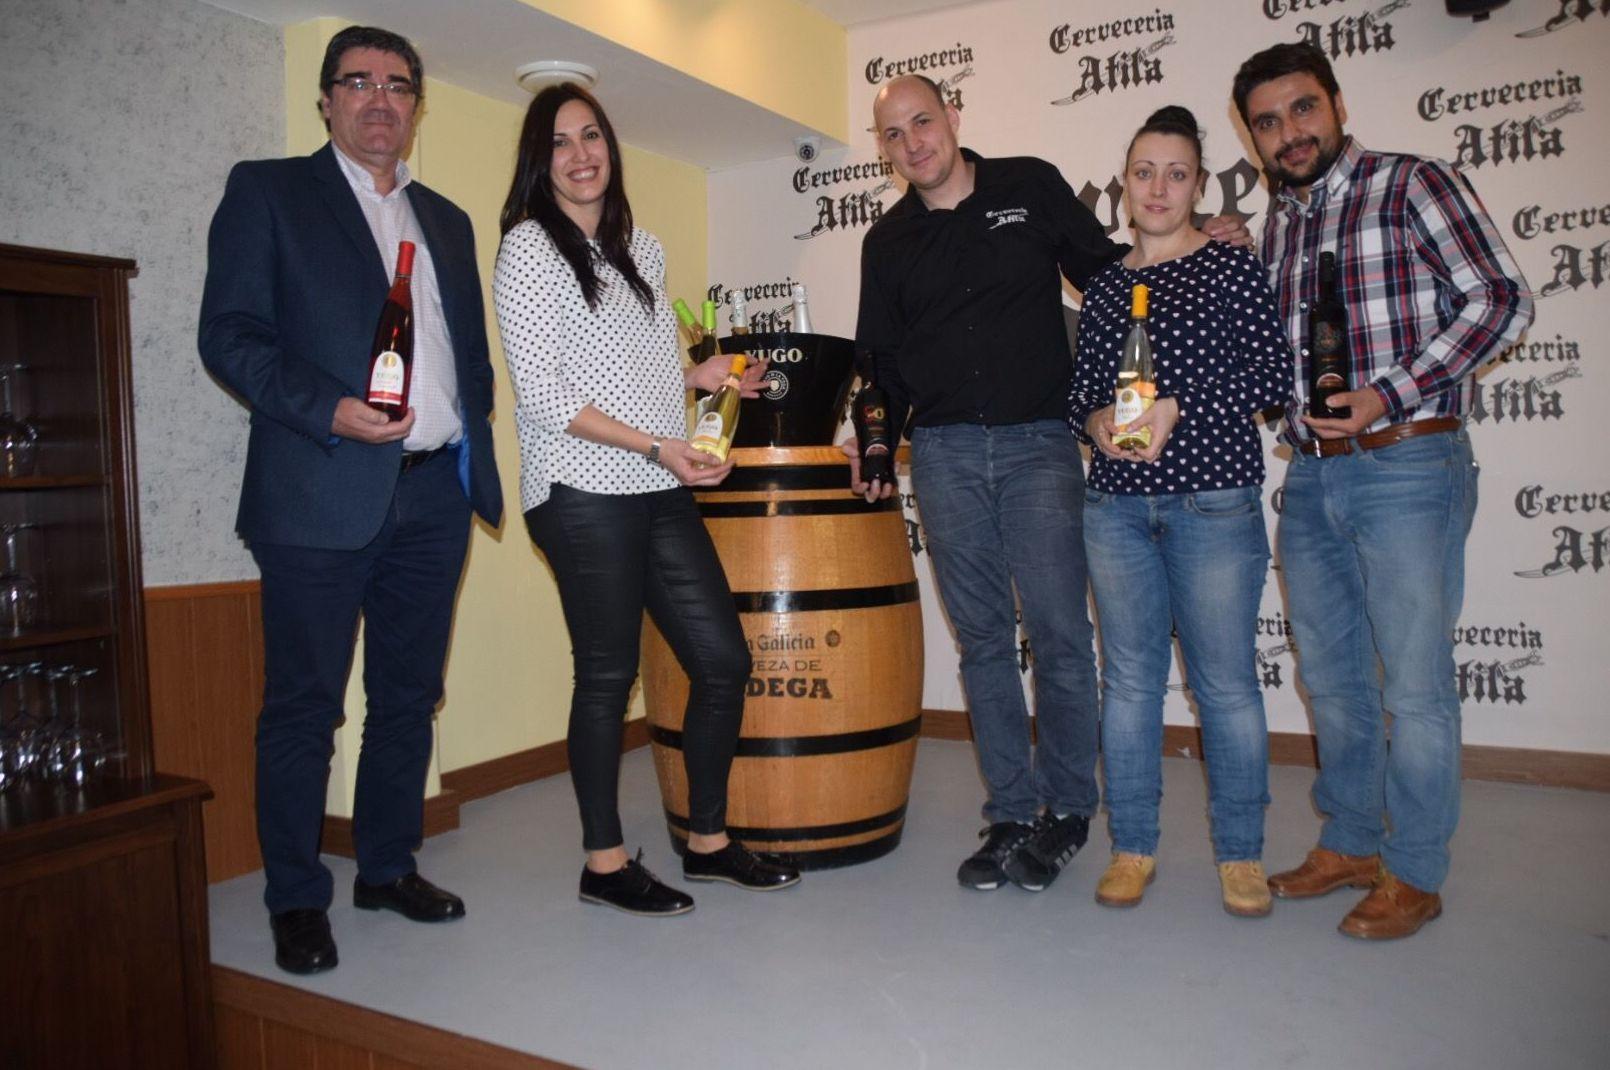 Foto 13 de Cervecerías en Pinto | Cervecería Atila